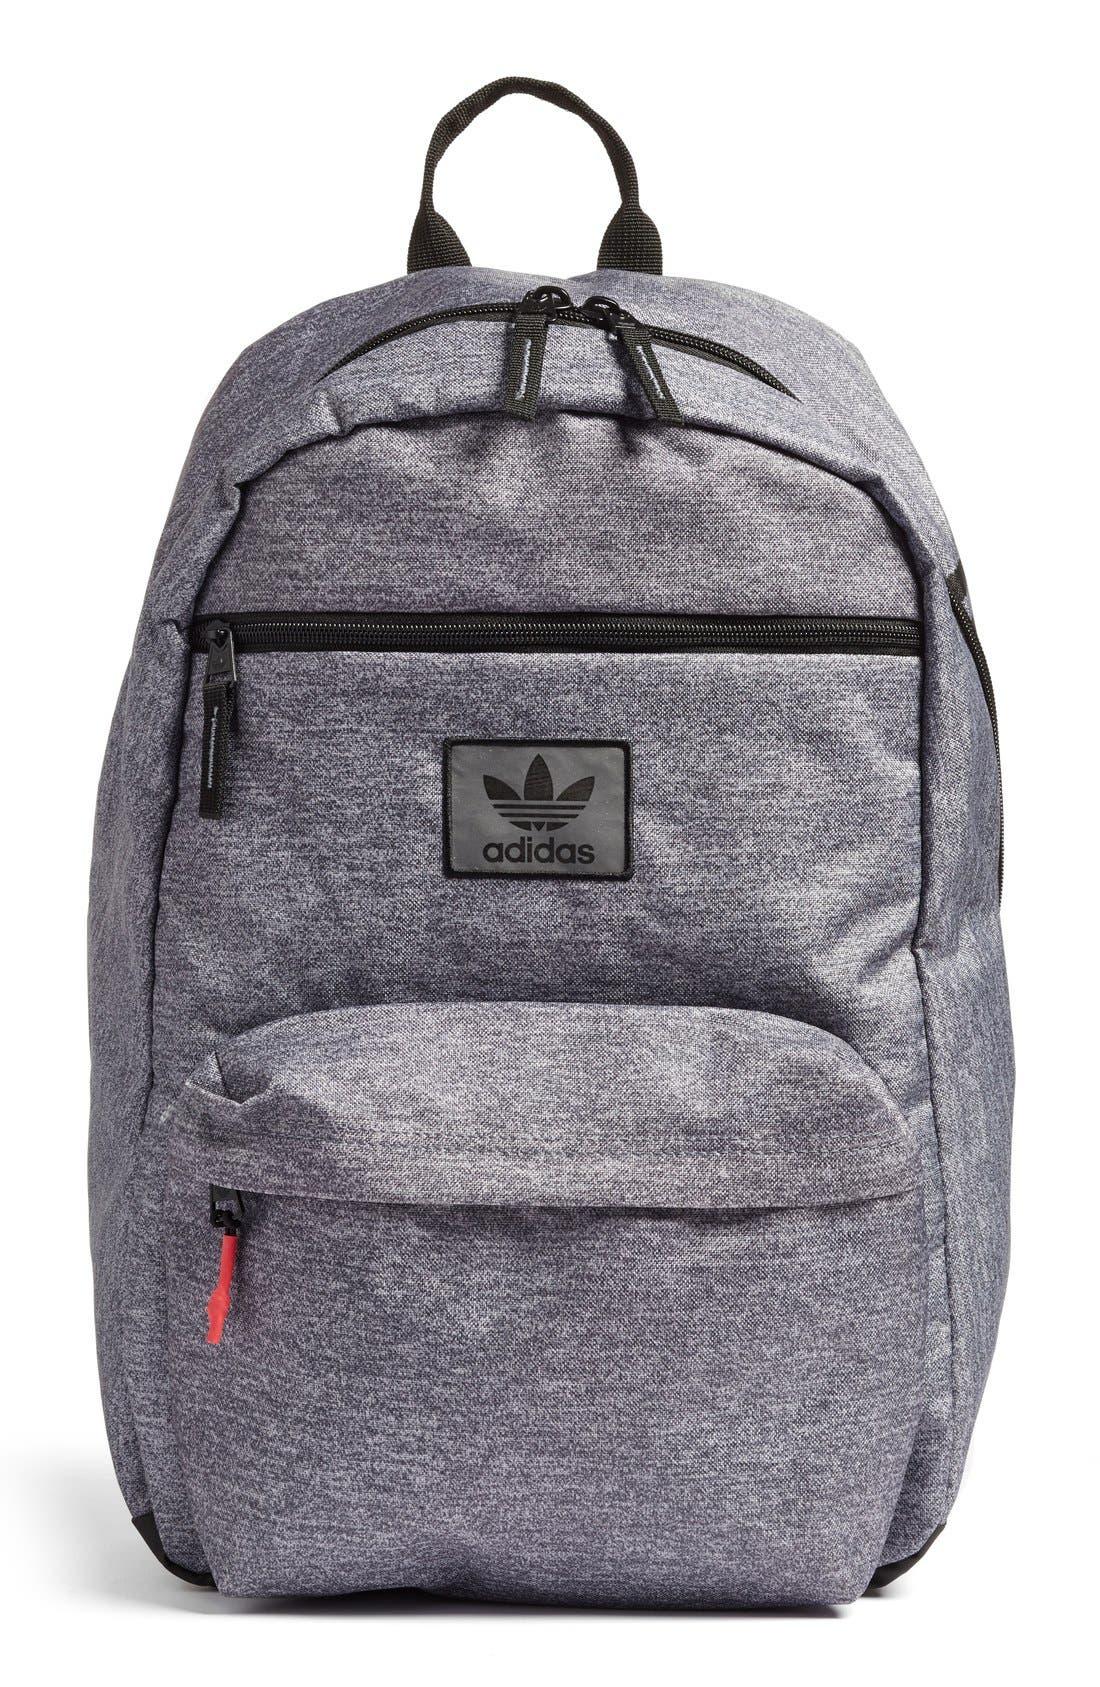 adidas Originals 'National' Backpack